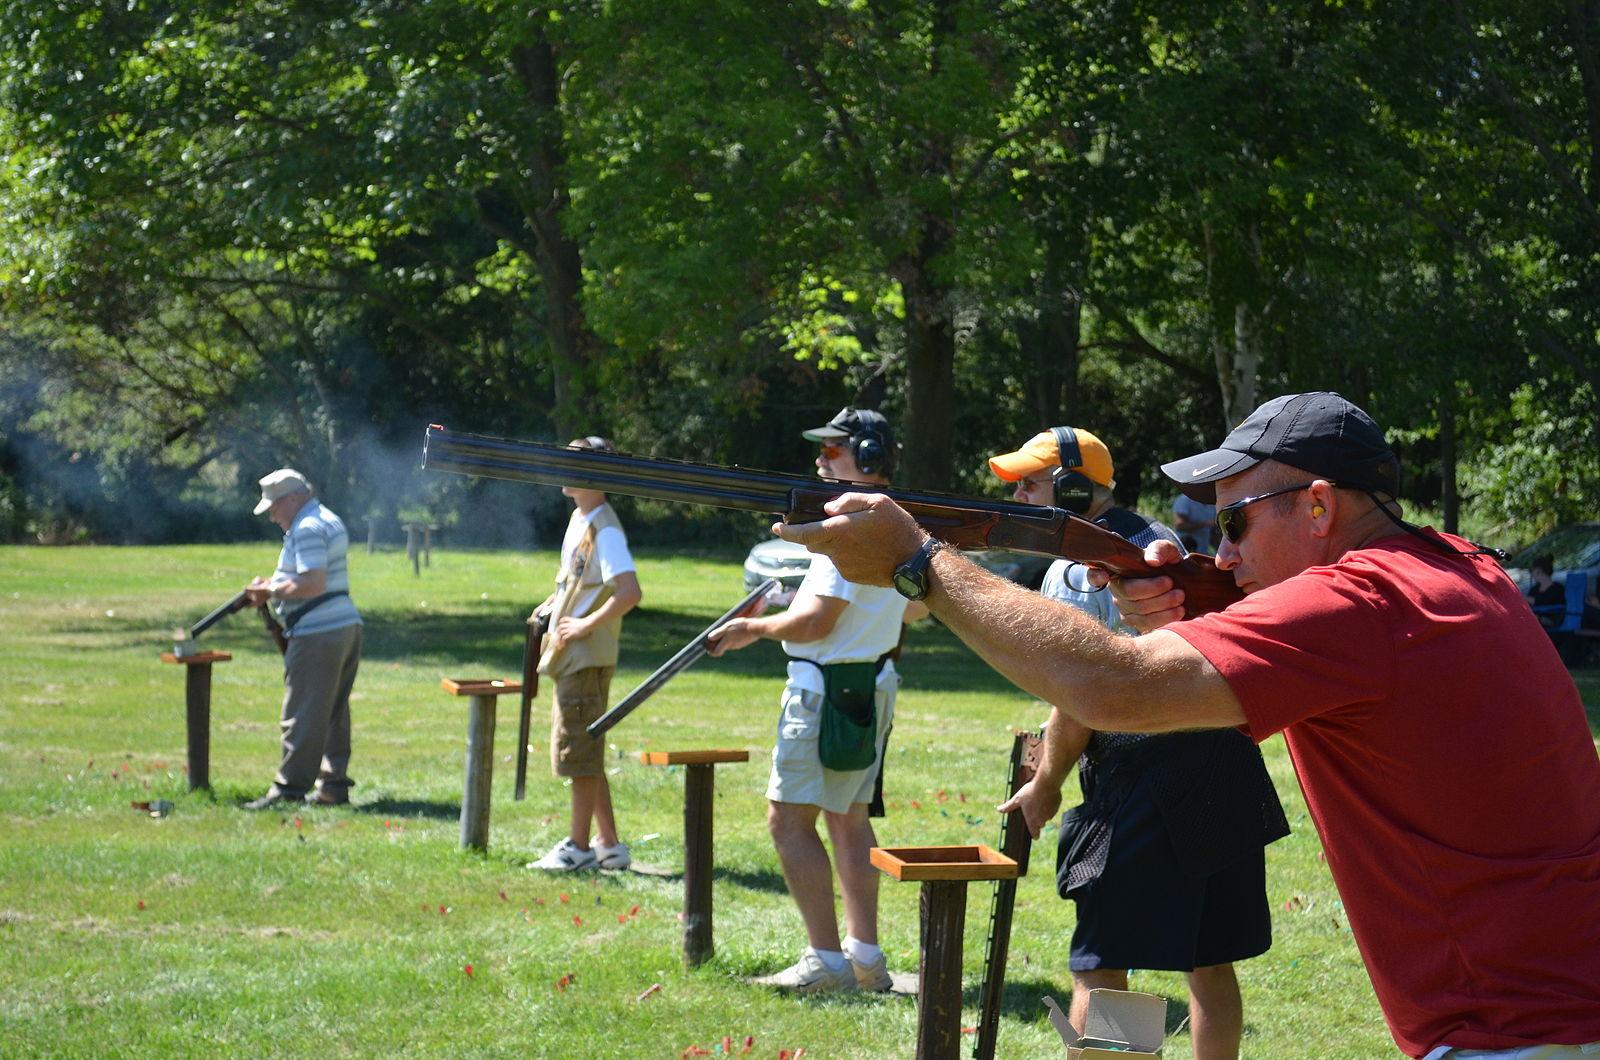 american trap shooting scene